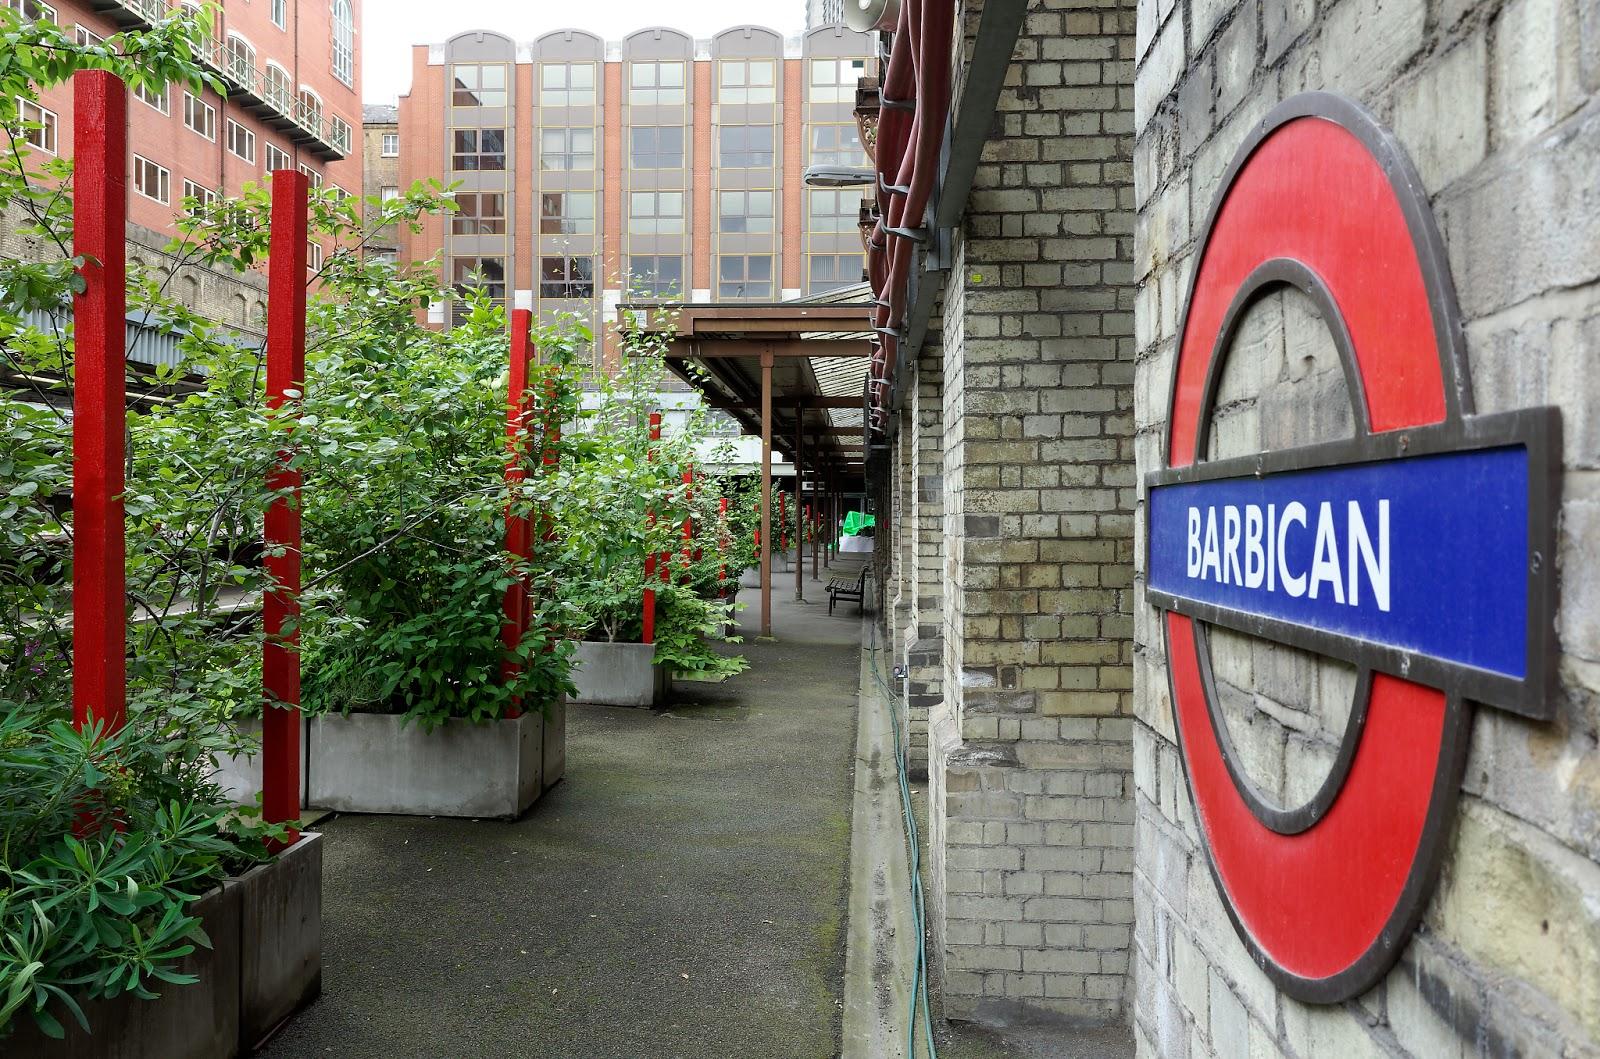 Open Garden Squares London - Barbican pop-up arden